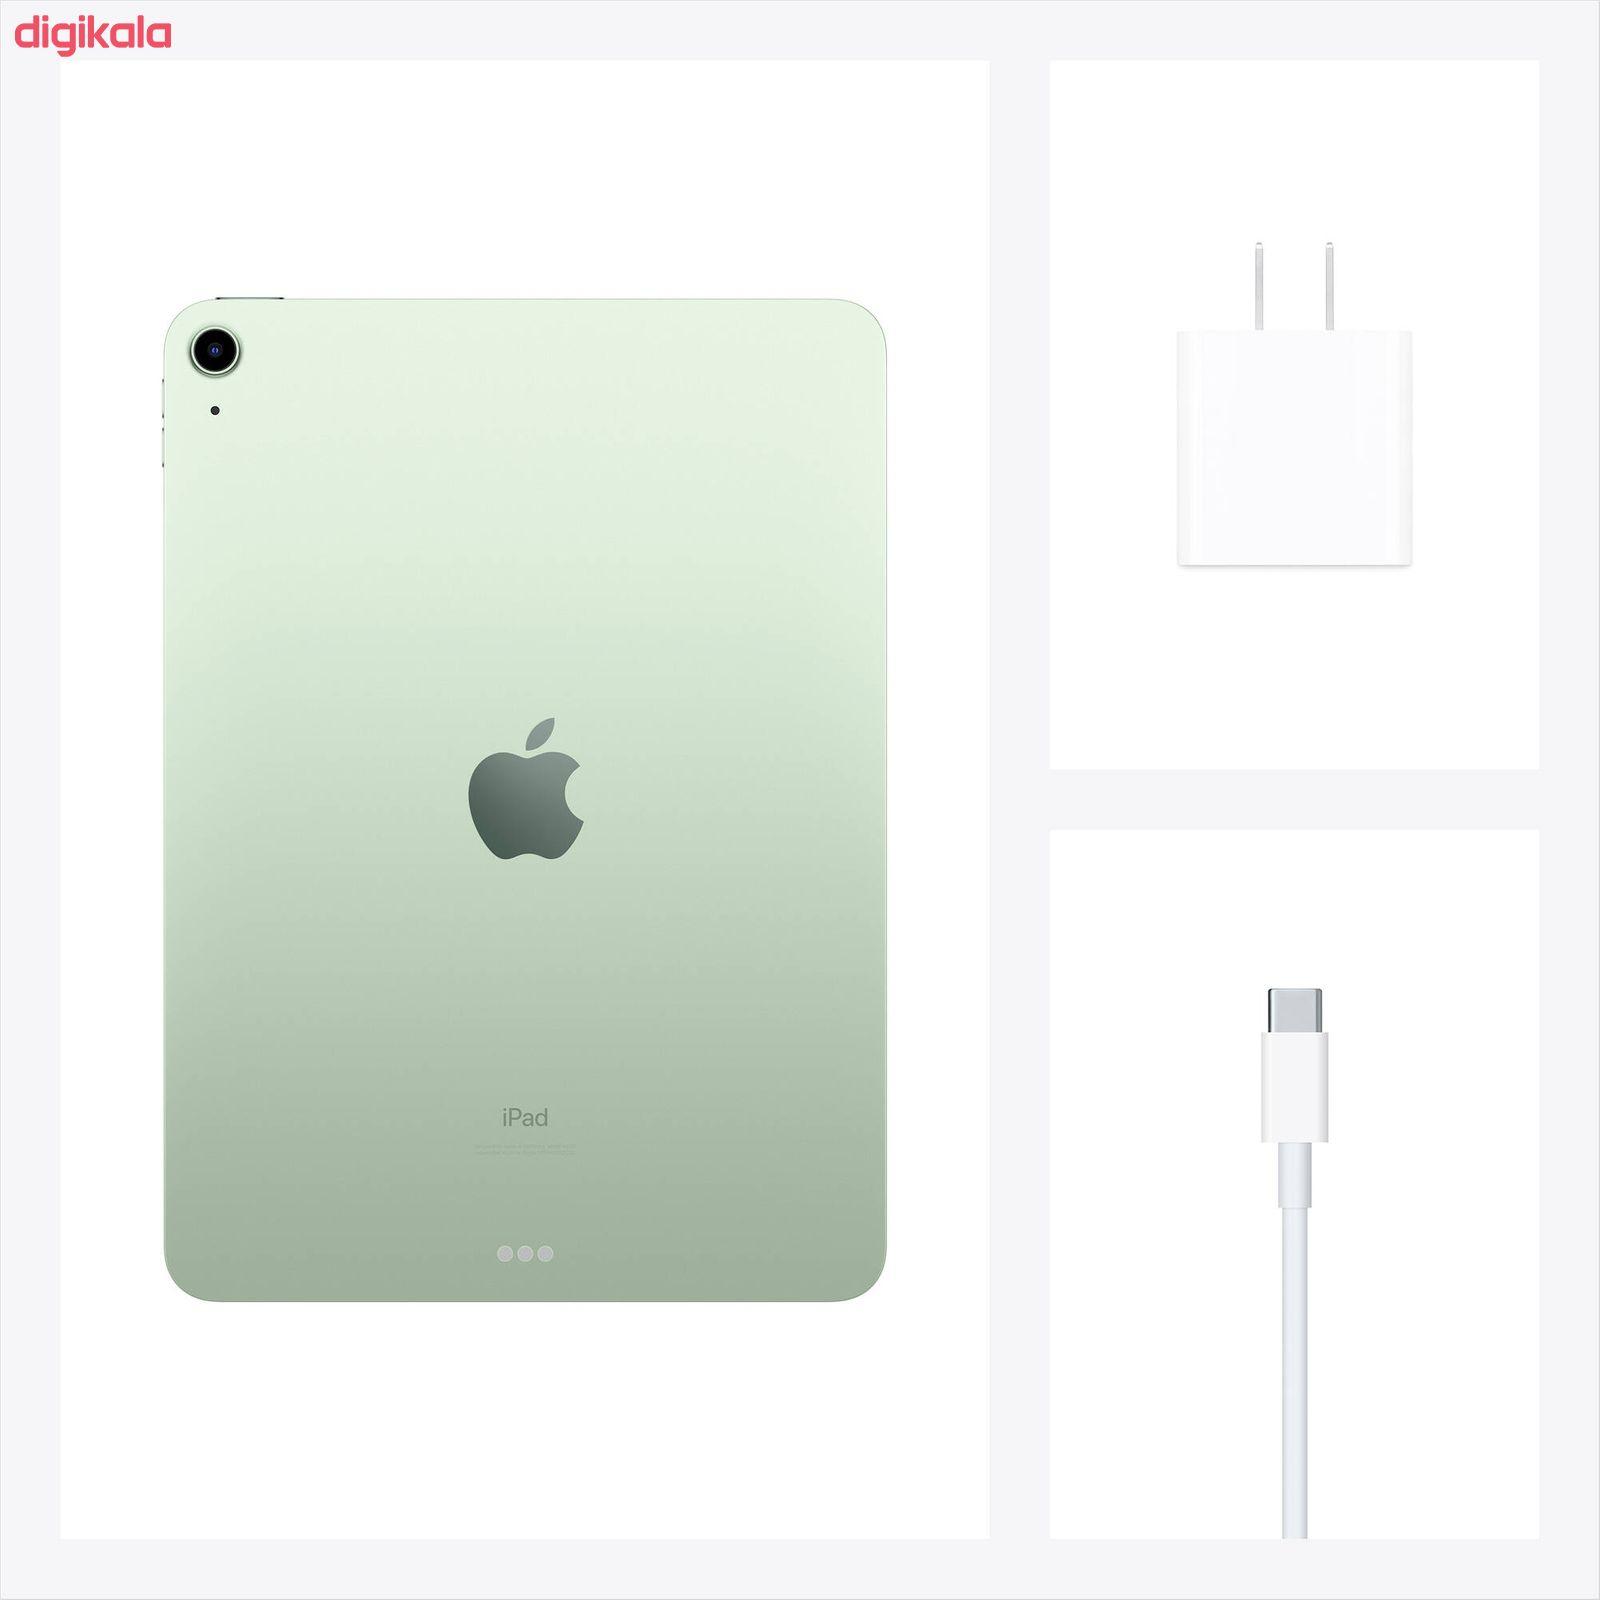 تبلت اپل مدل iPad Air 10.9 inch 2020 WiFi ظرفیت 256 گیگابایت  main 1 9